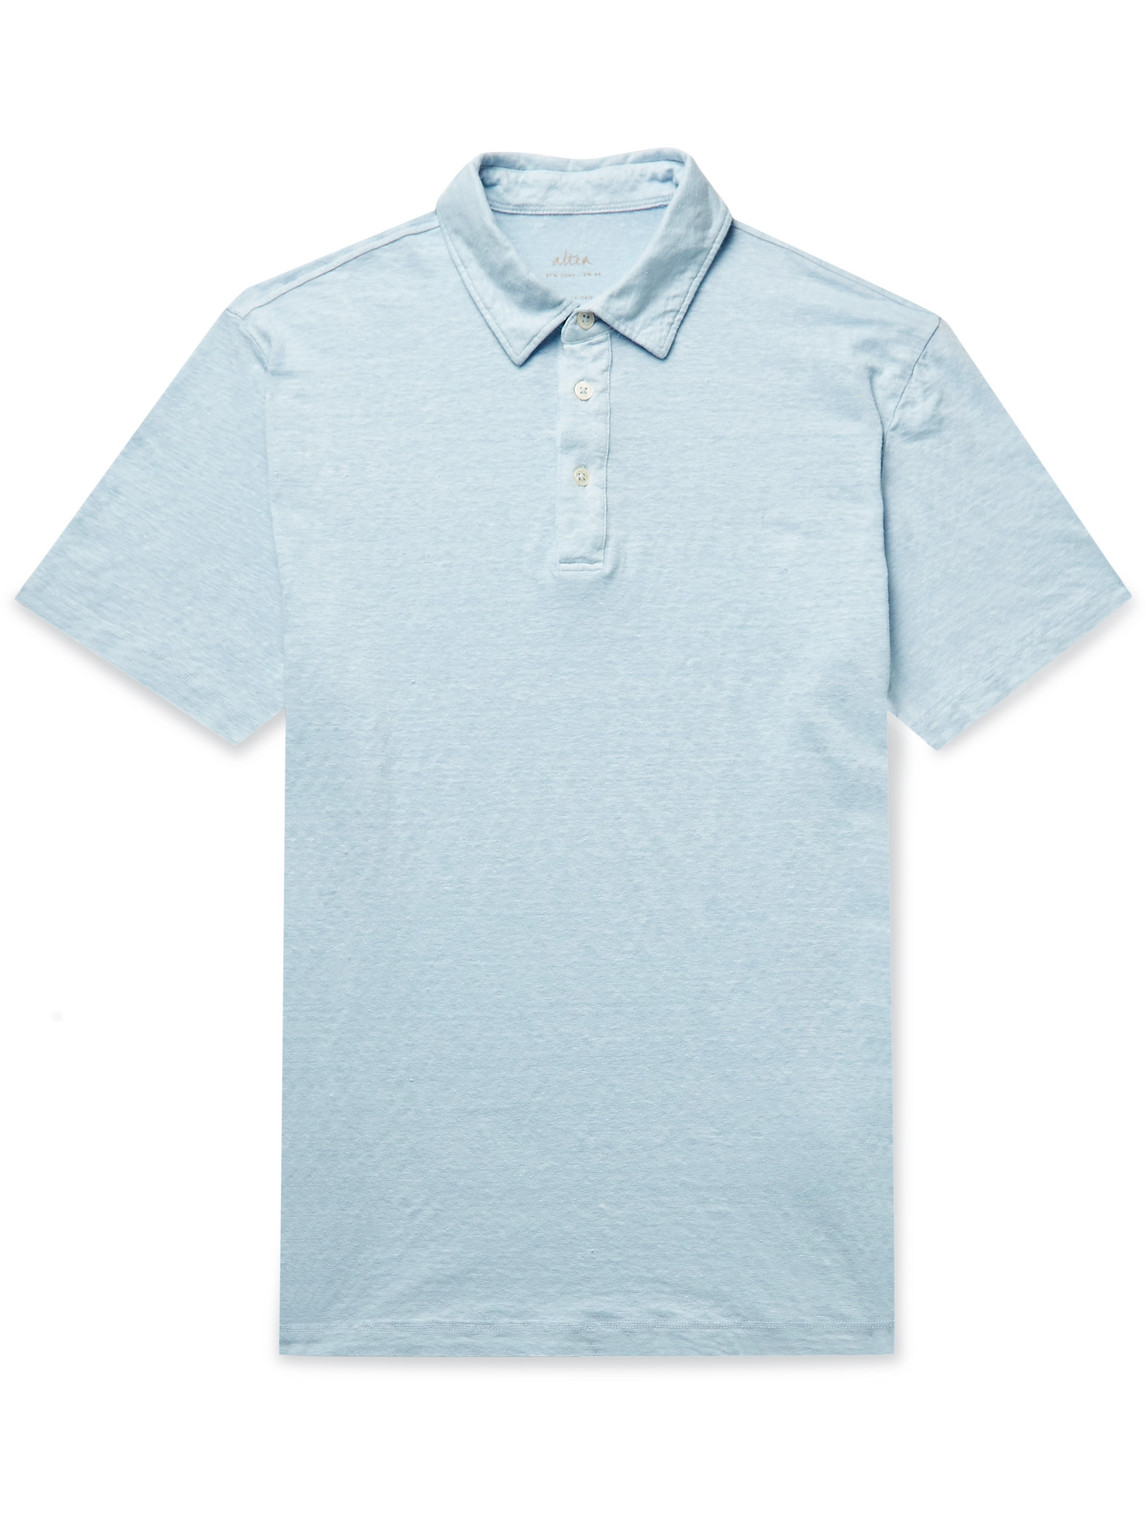 Altea Slub Stretch-linen Polo Shirt In Blue